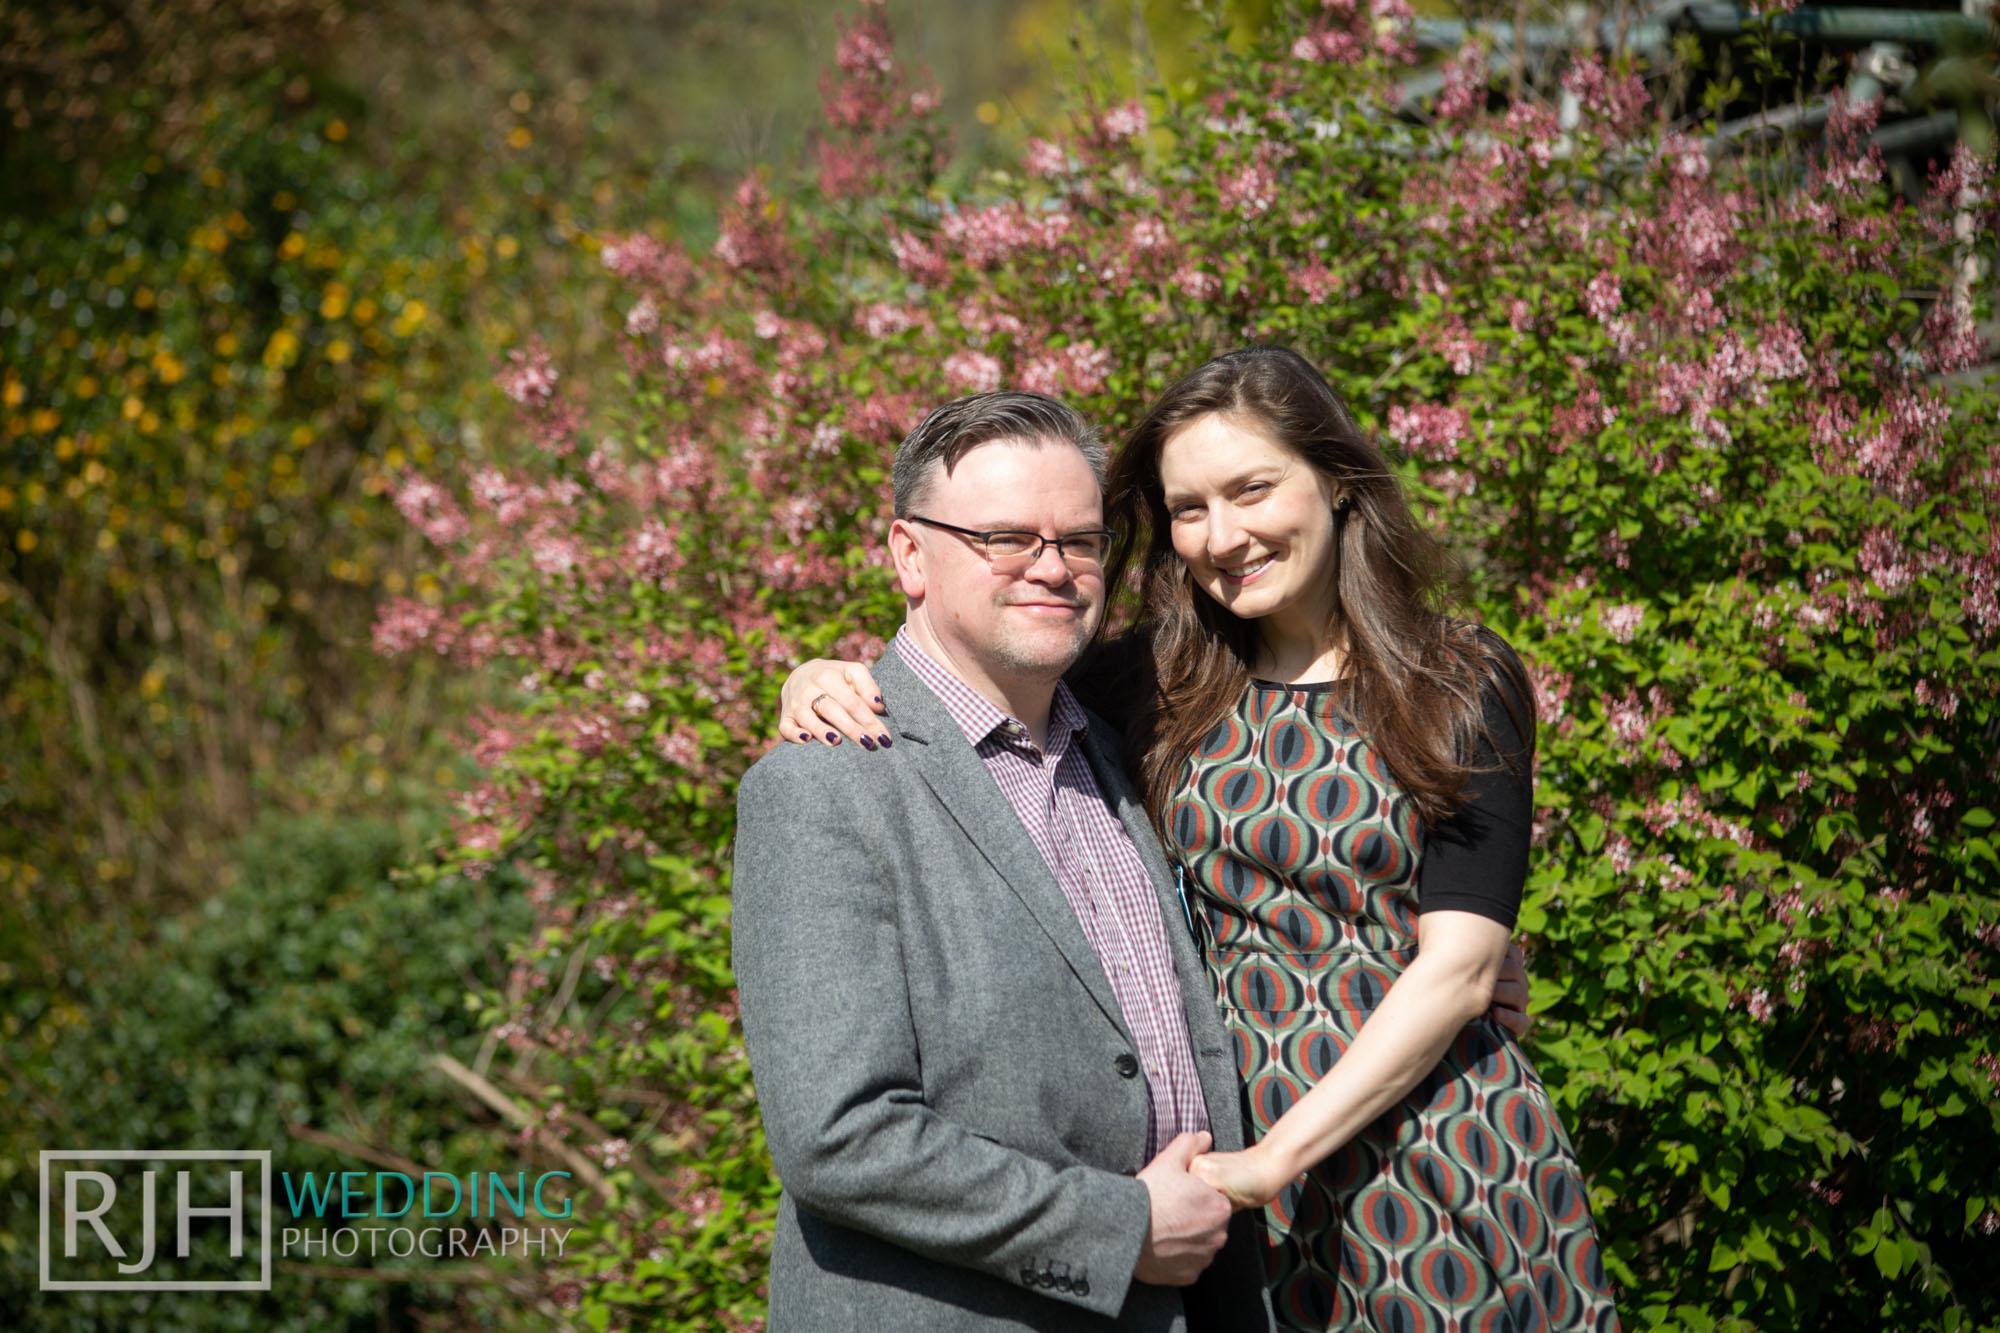 Pre-wedding photography - Richard & Rachel_003_3C2A8110.jpg